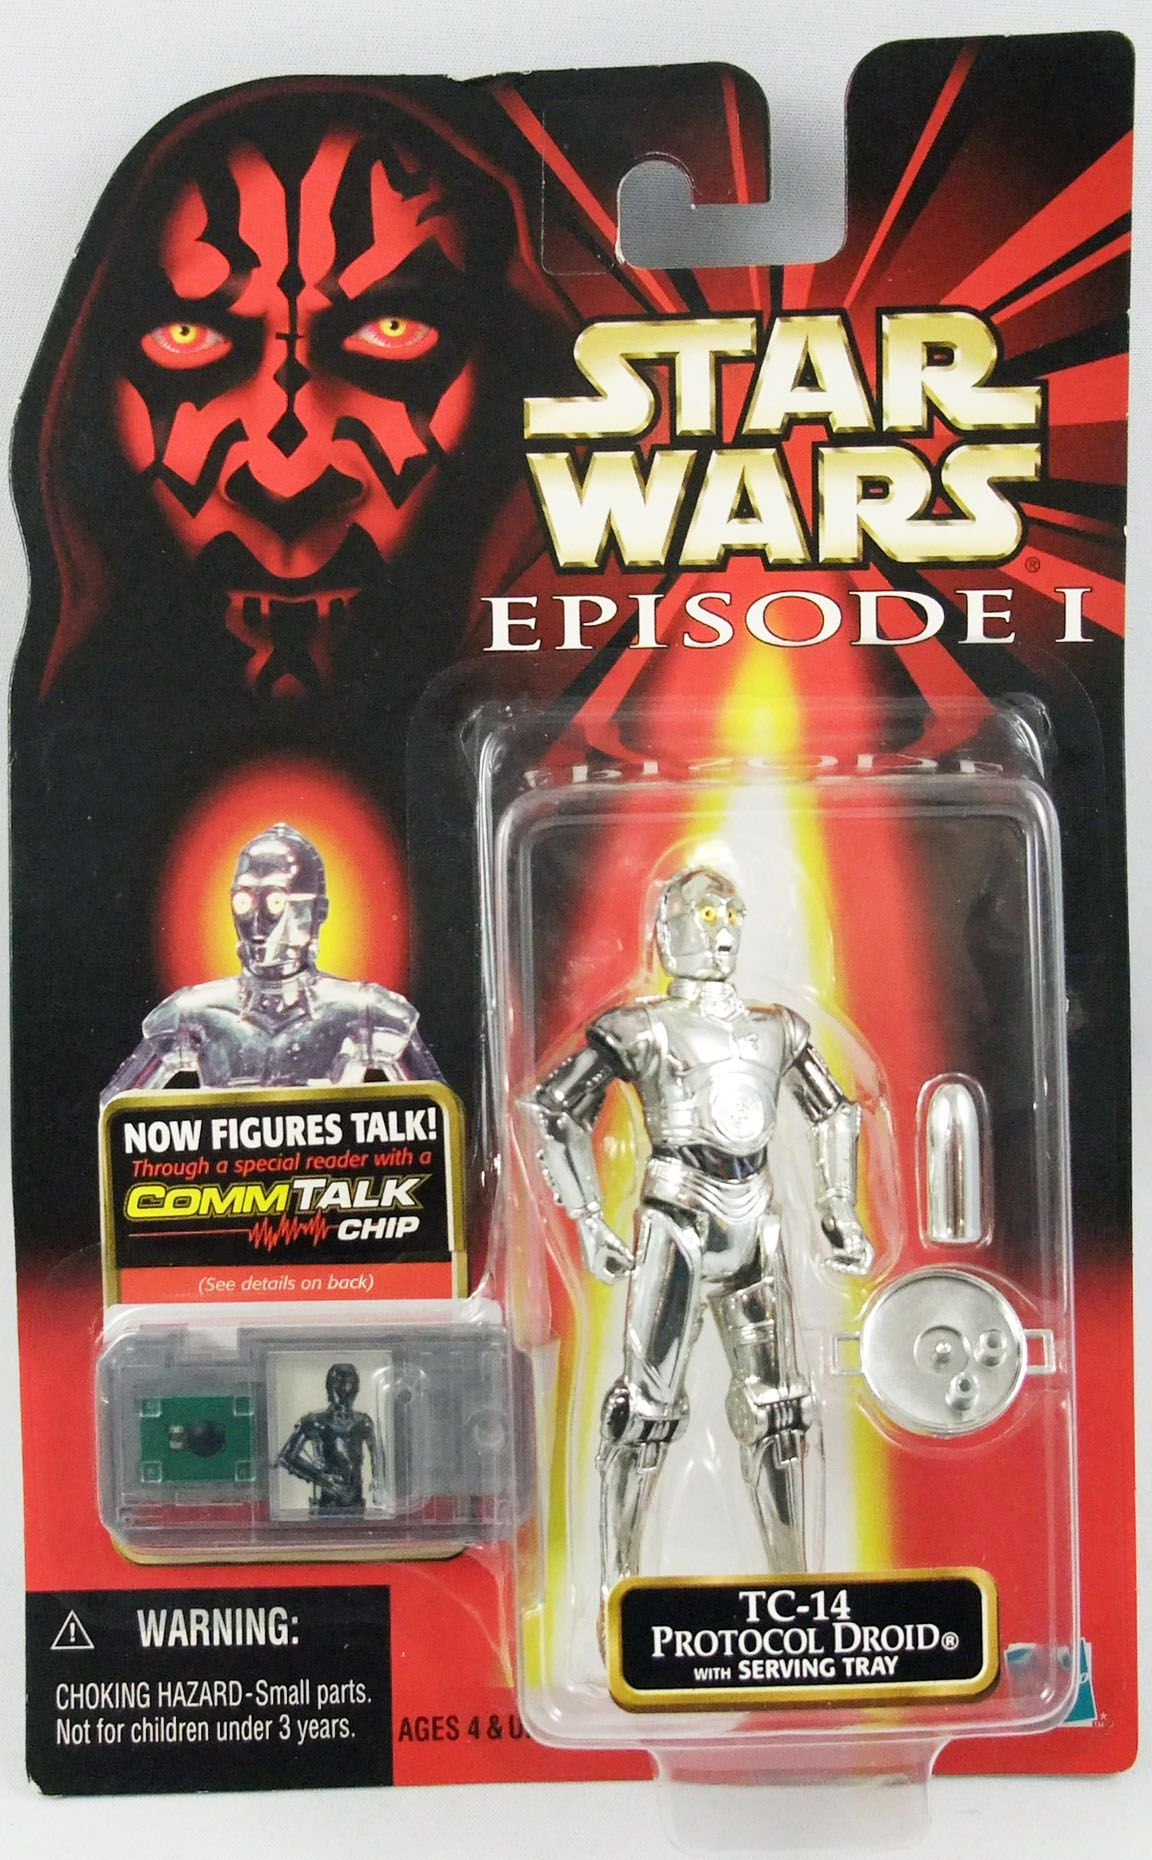 Star Wars Episode 1 (The Phantom Menace) - Hasbro - TC-14